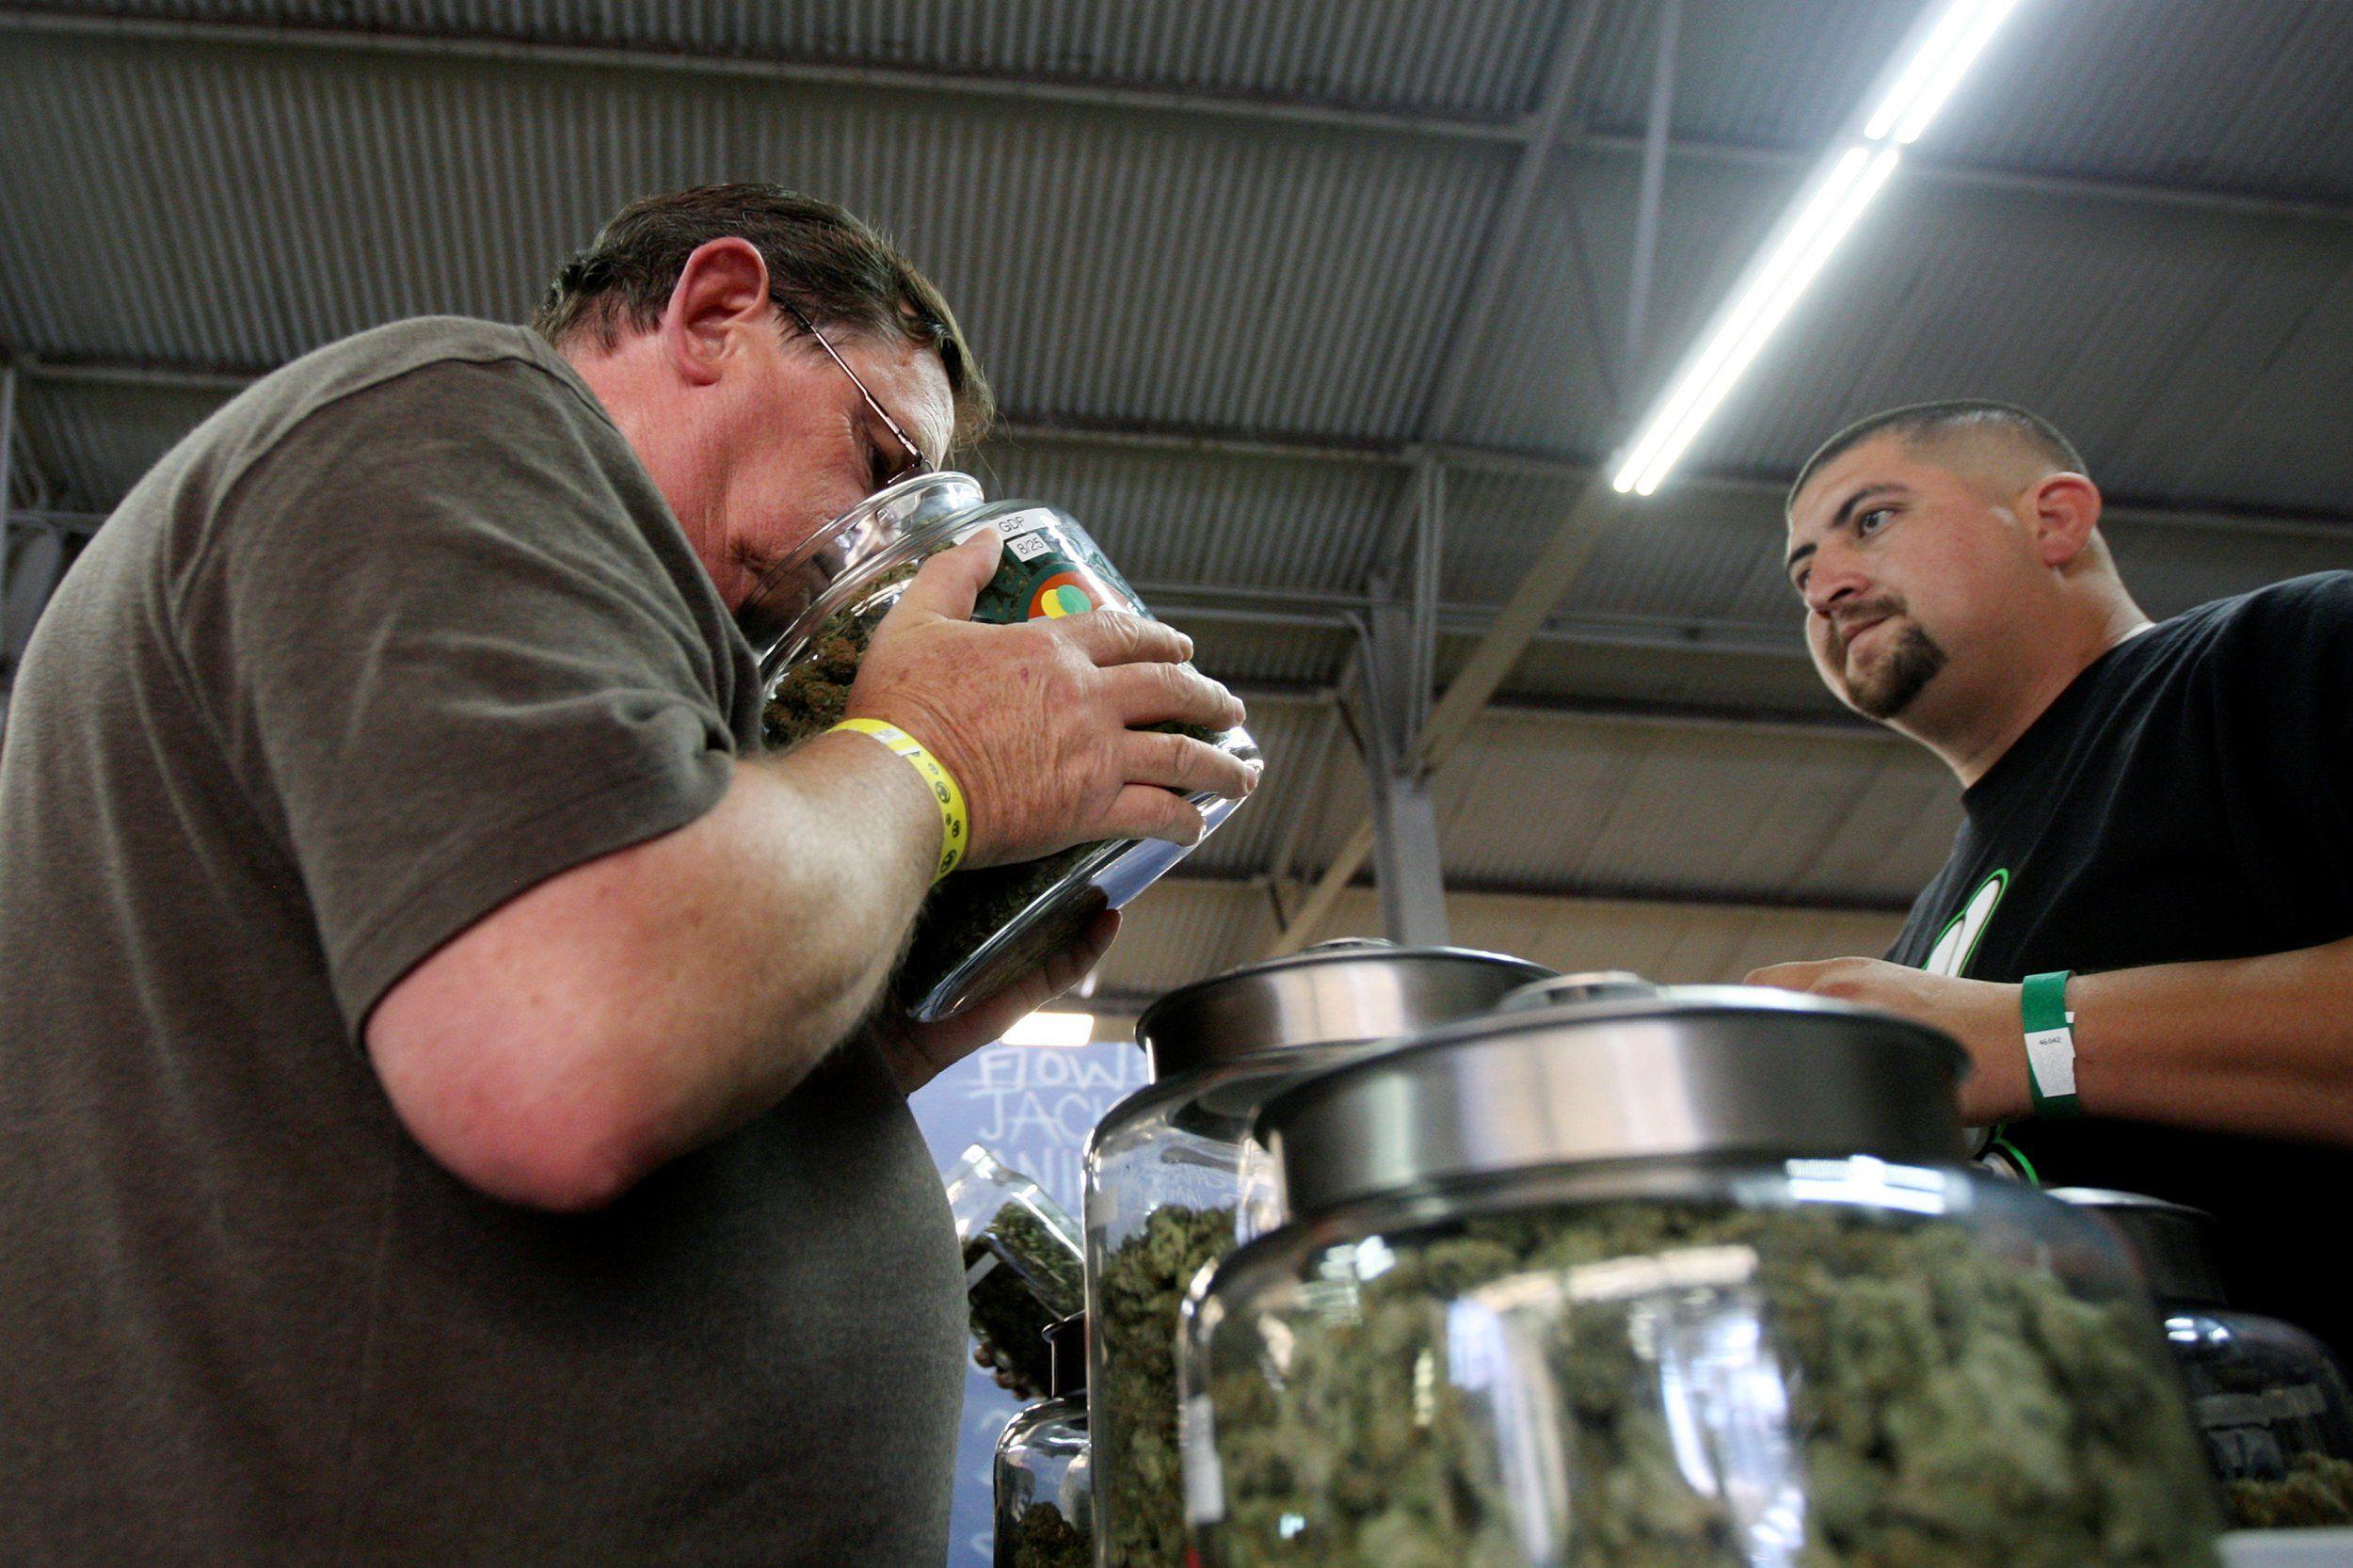 A marijuana tech company says data shows increased access to pot decreases alcohol use